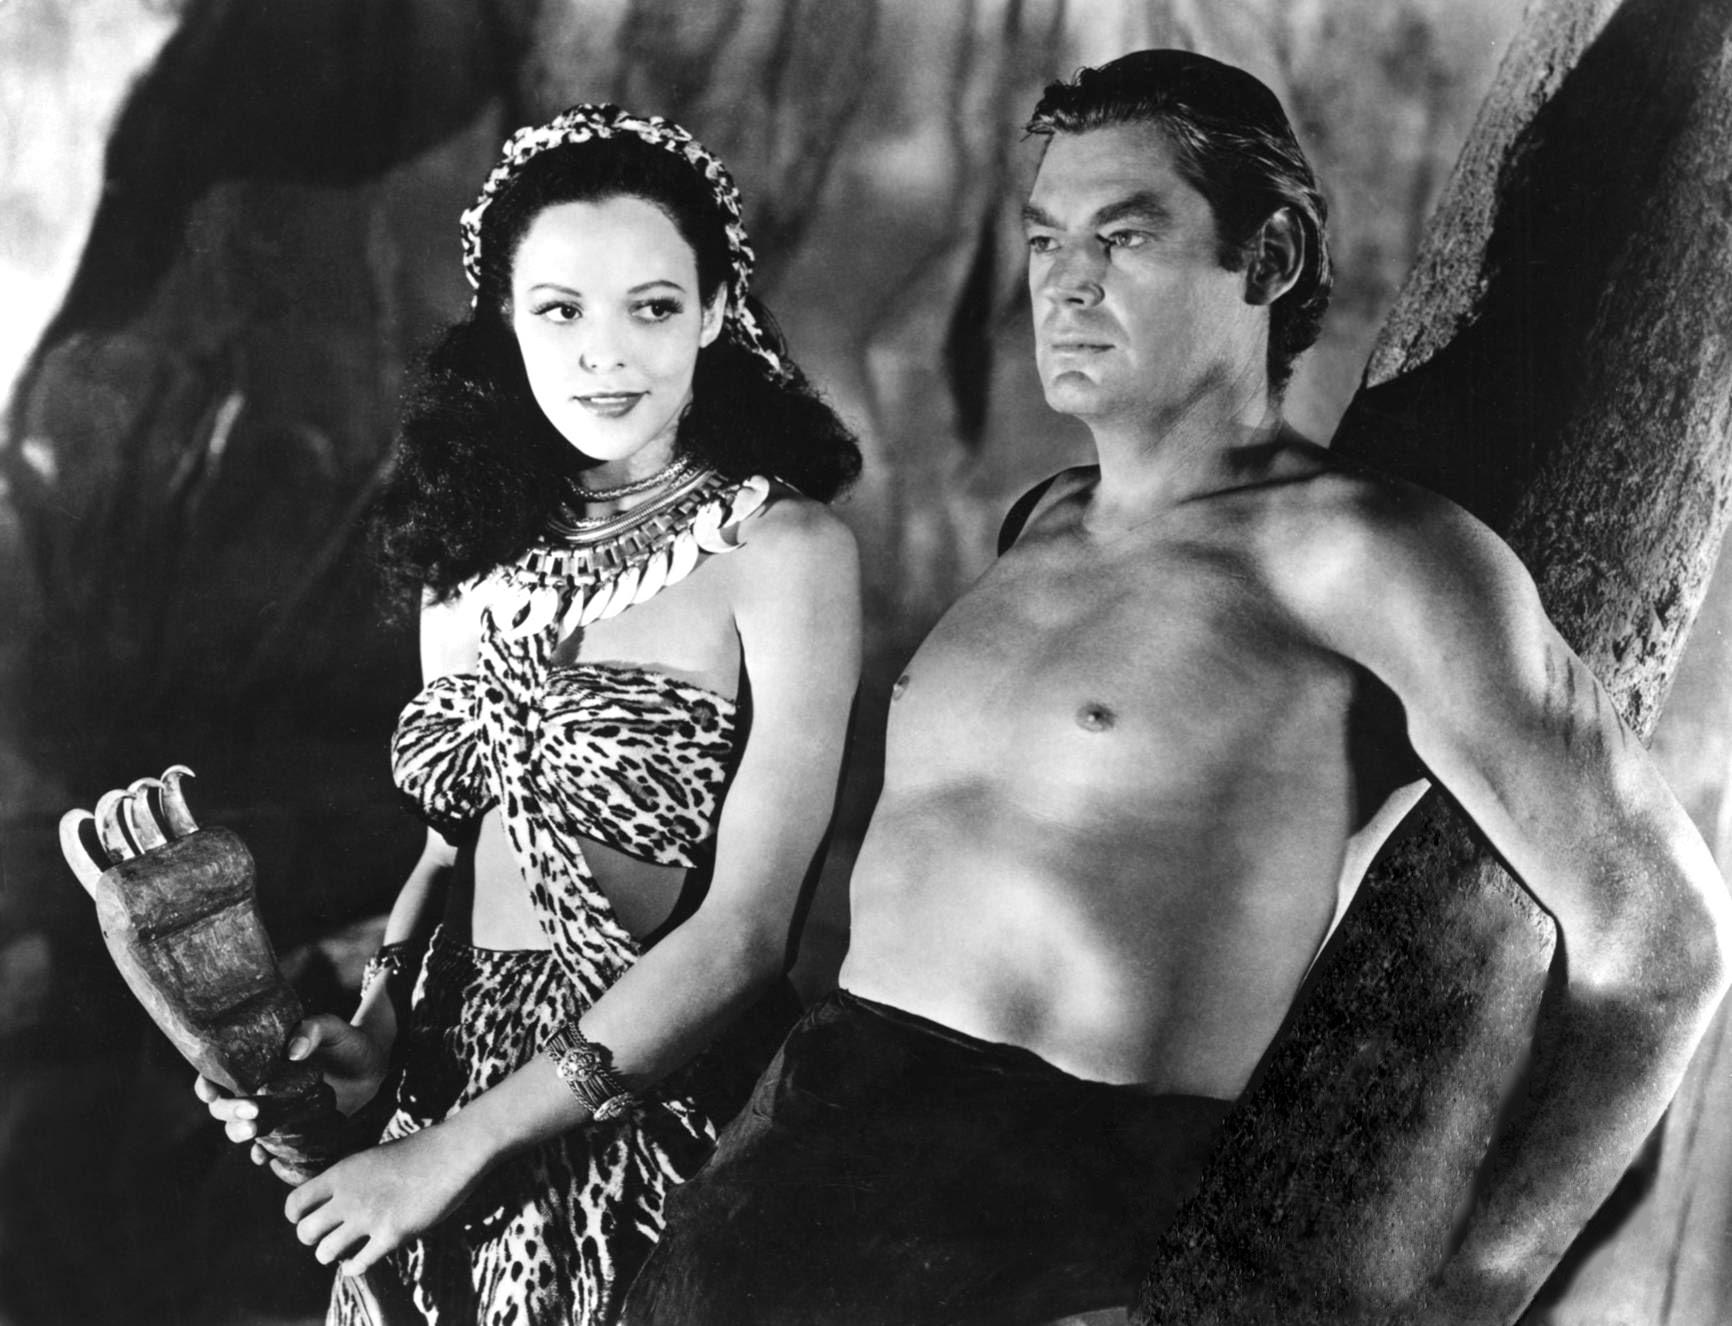 Resultado de imagem para Tarzan and the Leopard Woman 1946